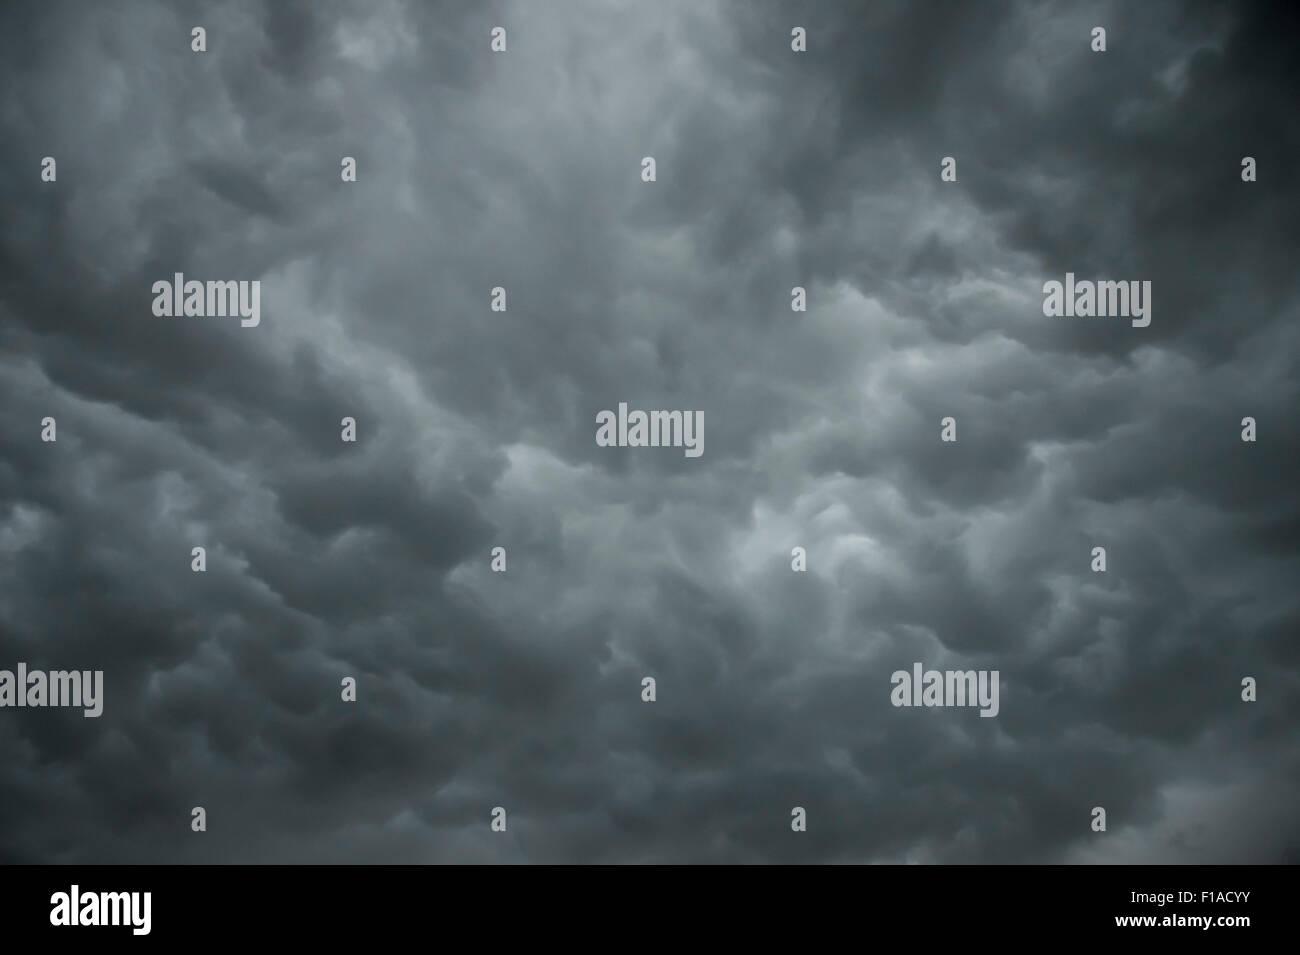 Dark Storm Clouds - Stock Image